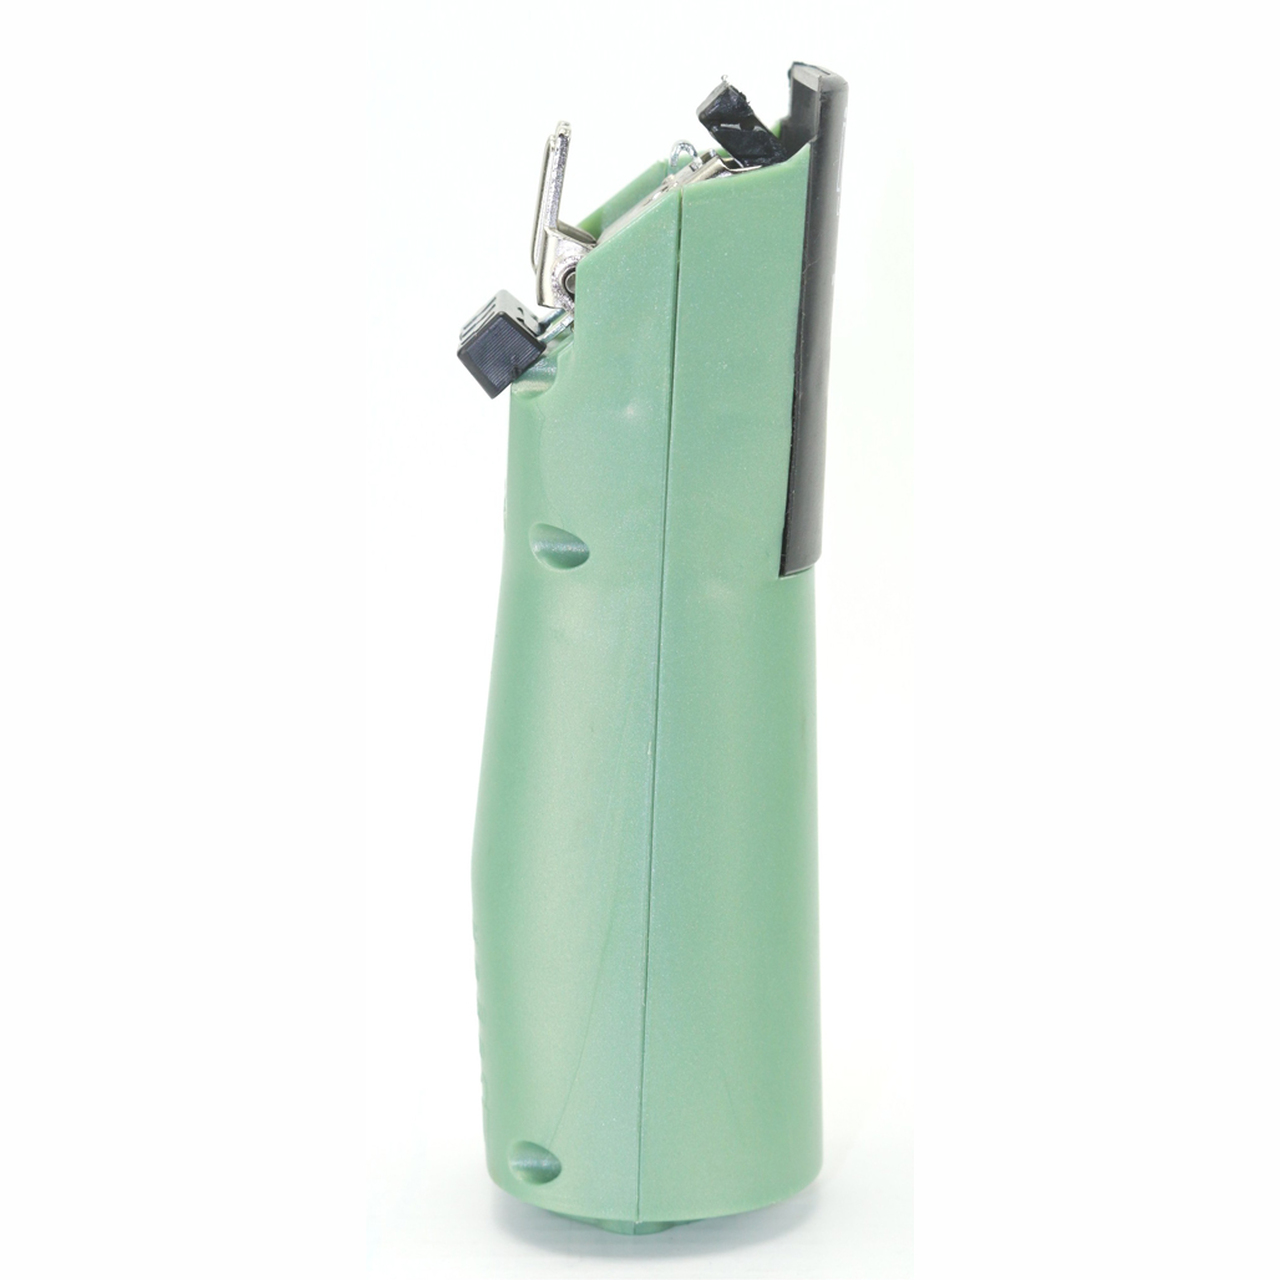 Laube iClip Sage Green handpiece side view.